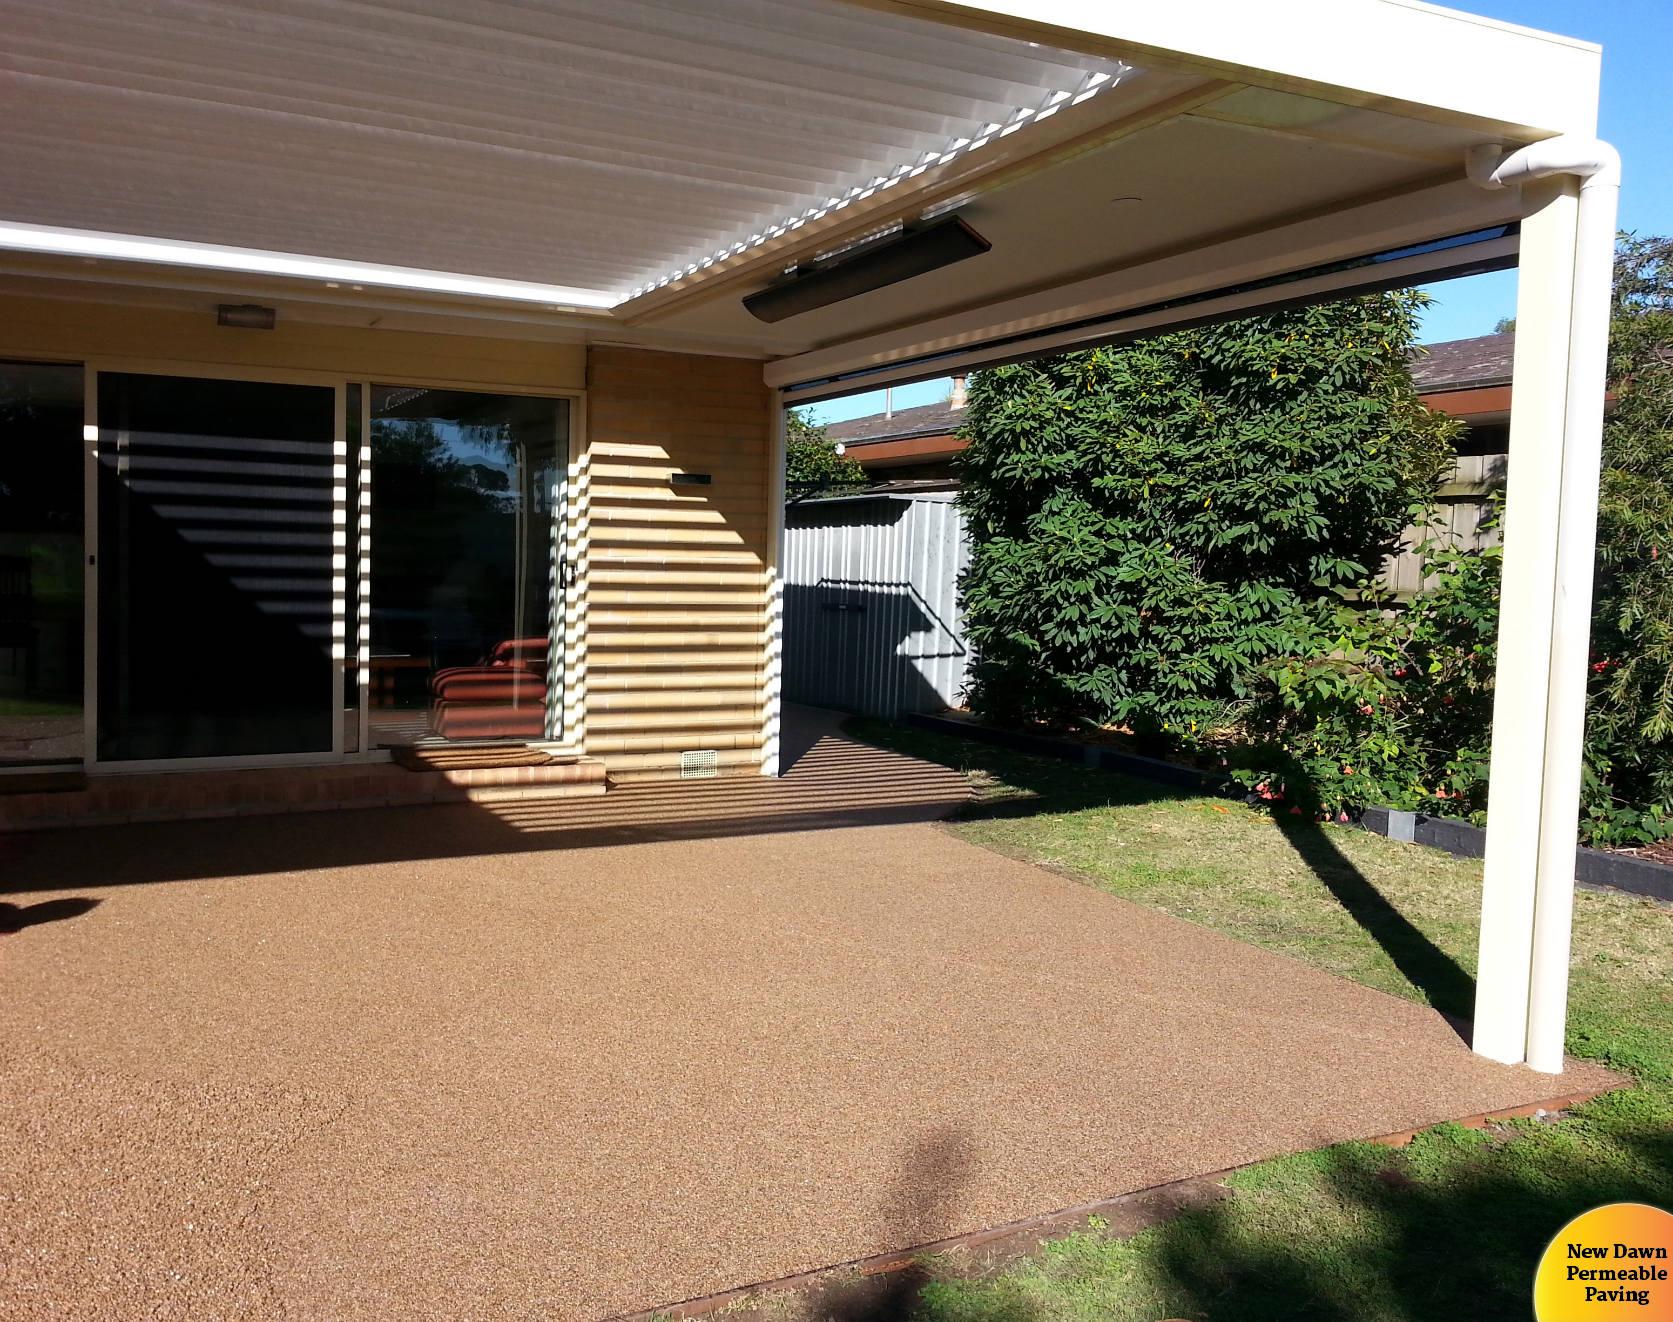 driveway resurfacing or new concrete